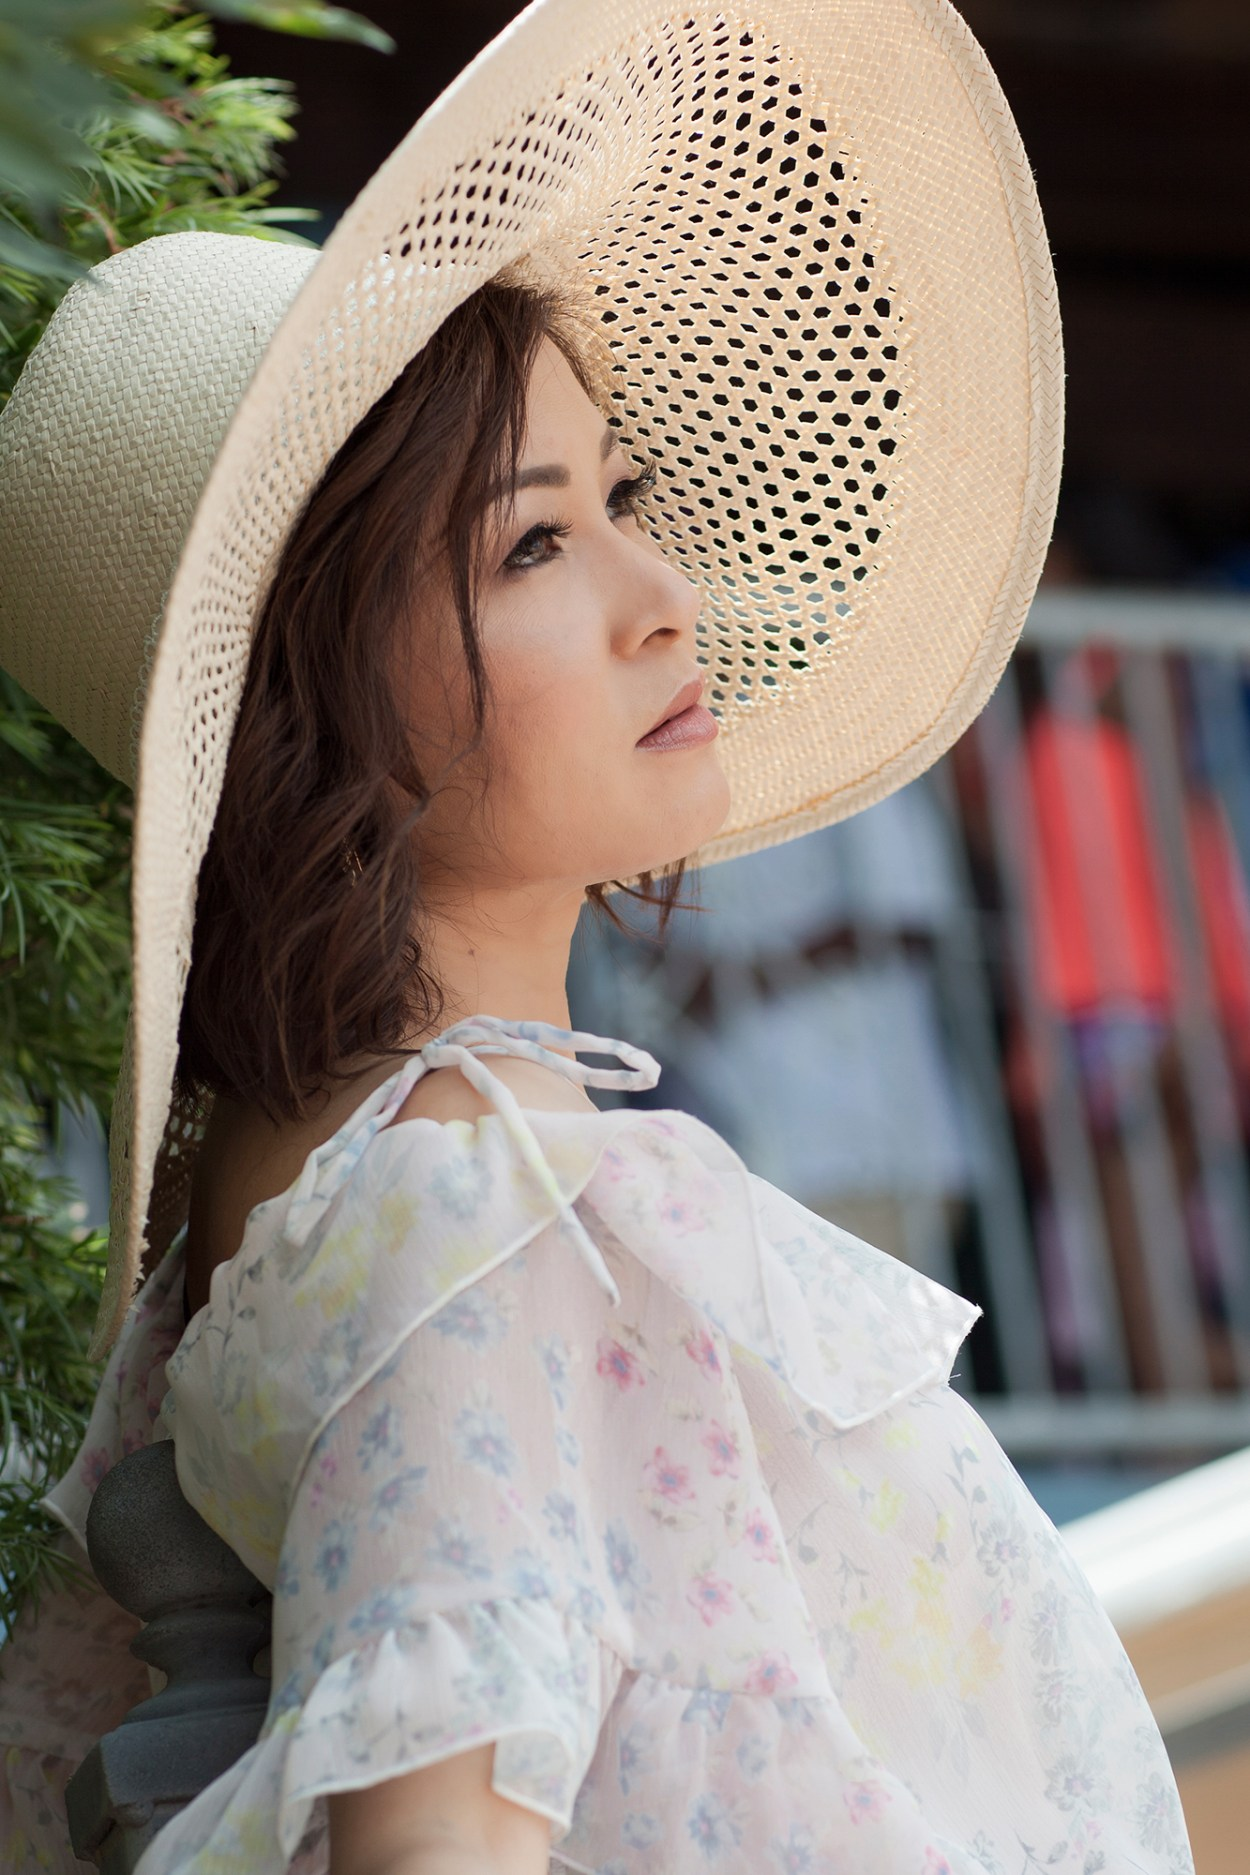 5-Liz-Lisa-Fashion-Women-Summer-Style-Trend-Kemah-2